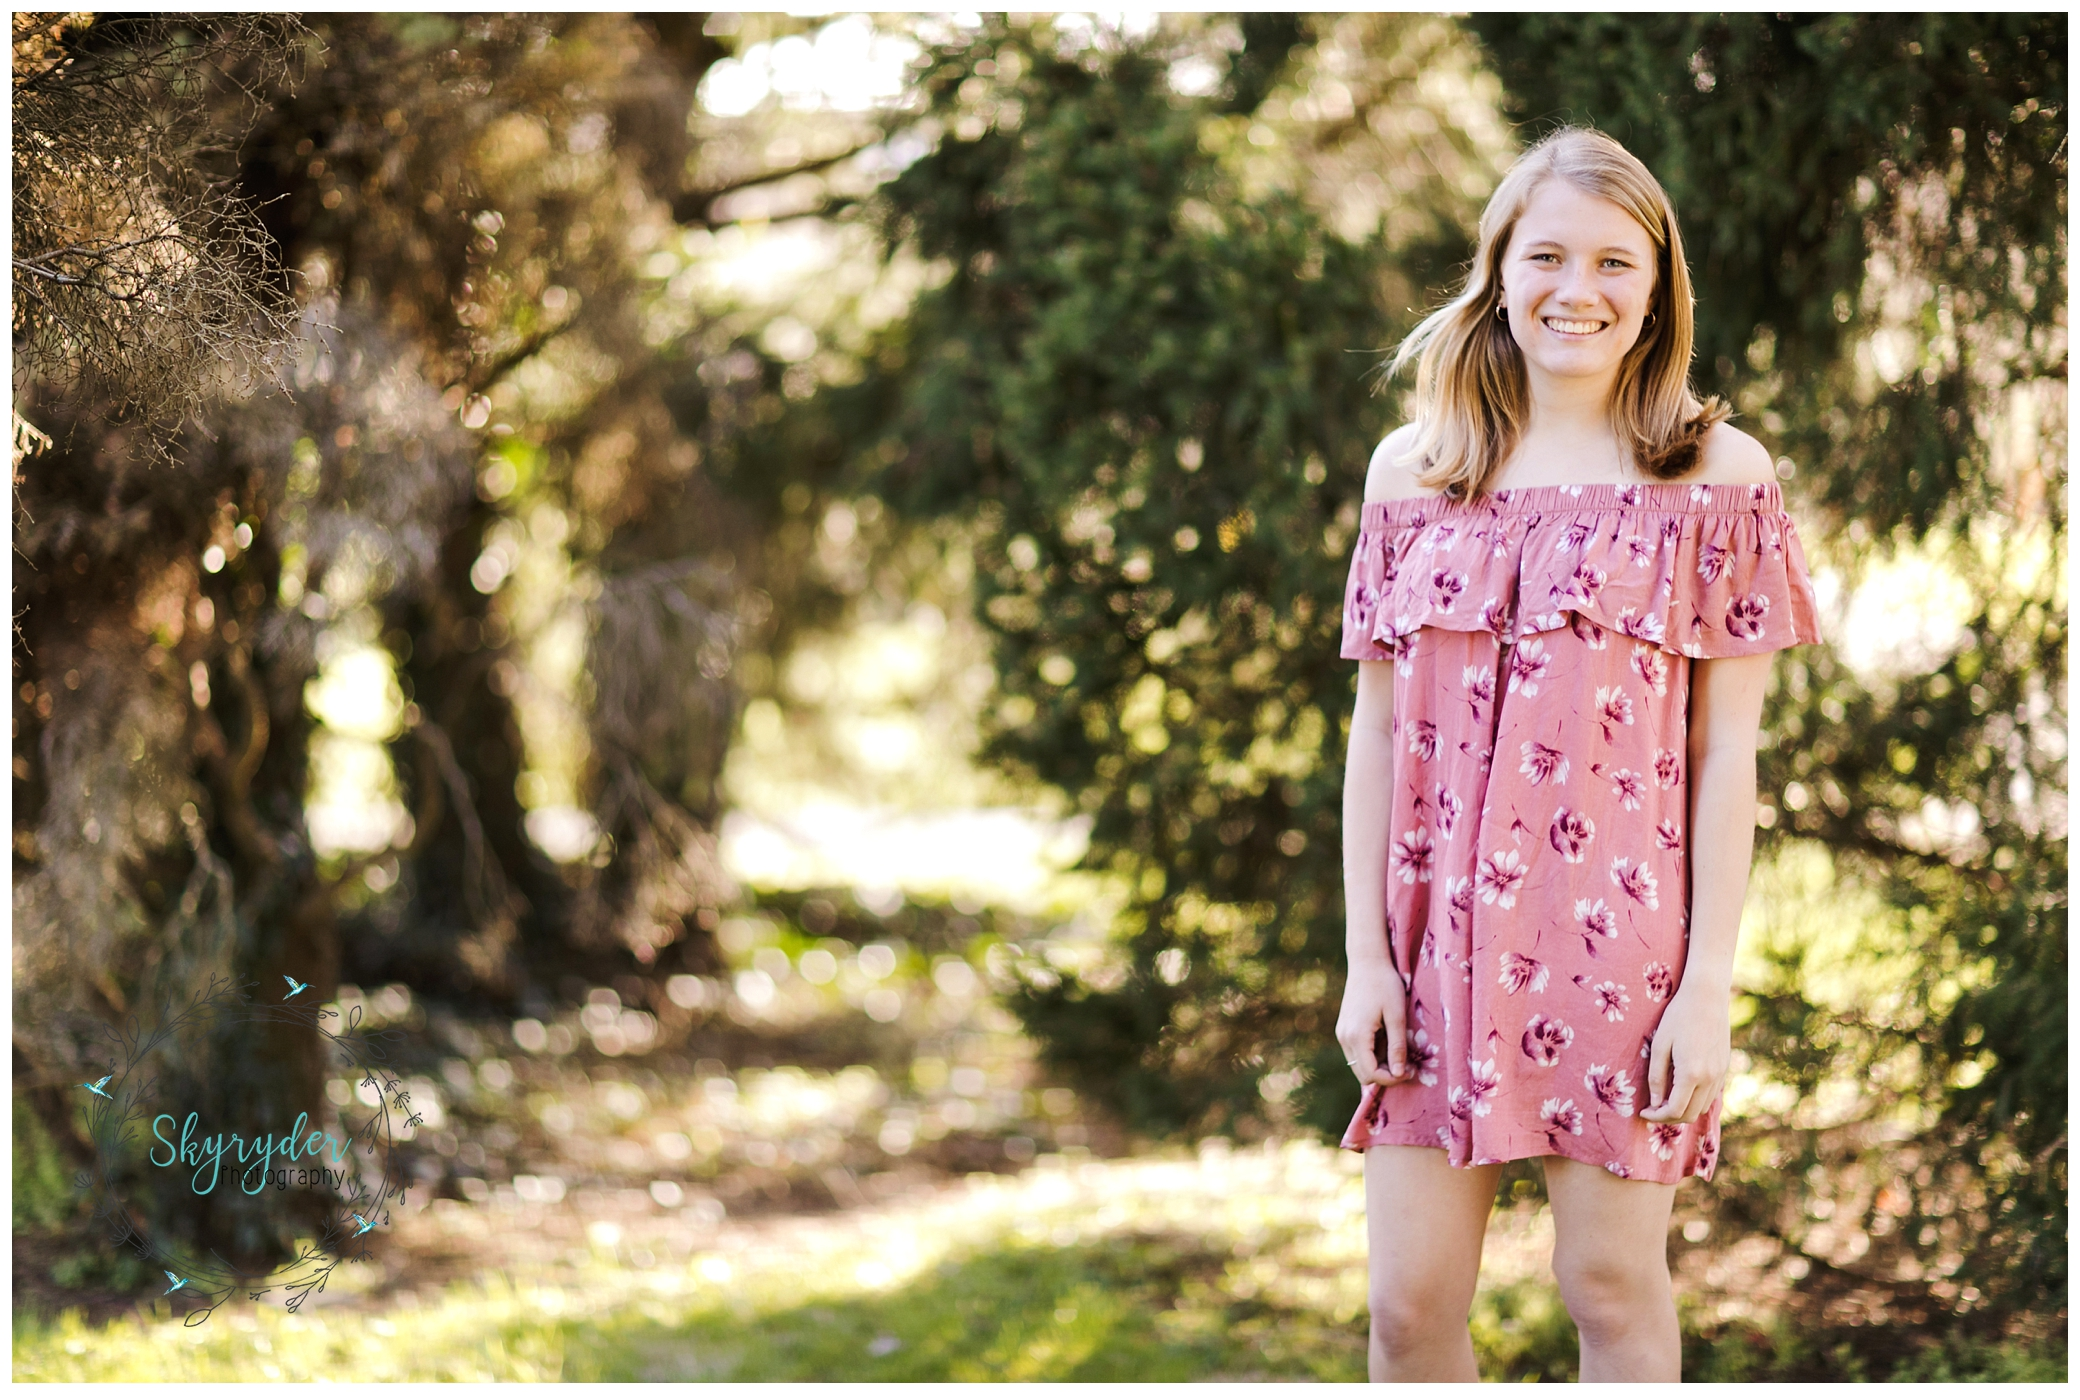 Simonne | Blacksburg High School Senior Photographer | Hahn Horticulture Garden